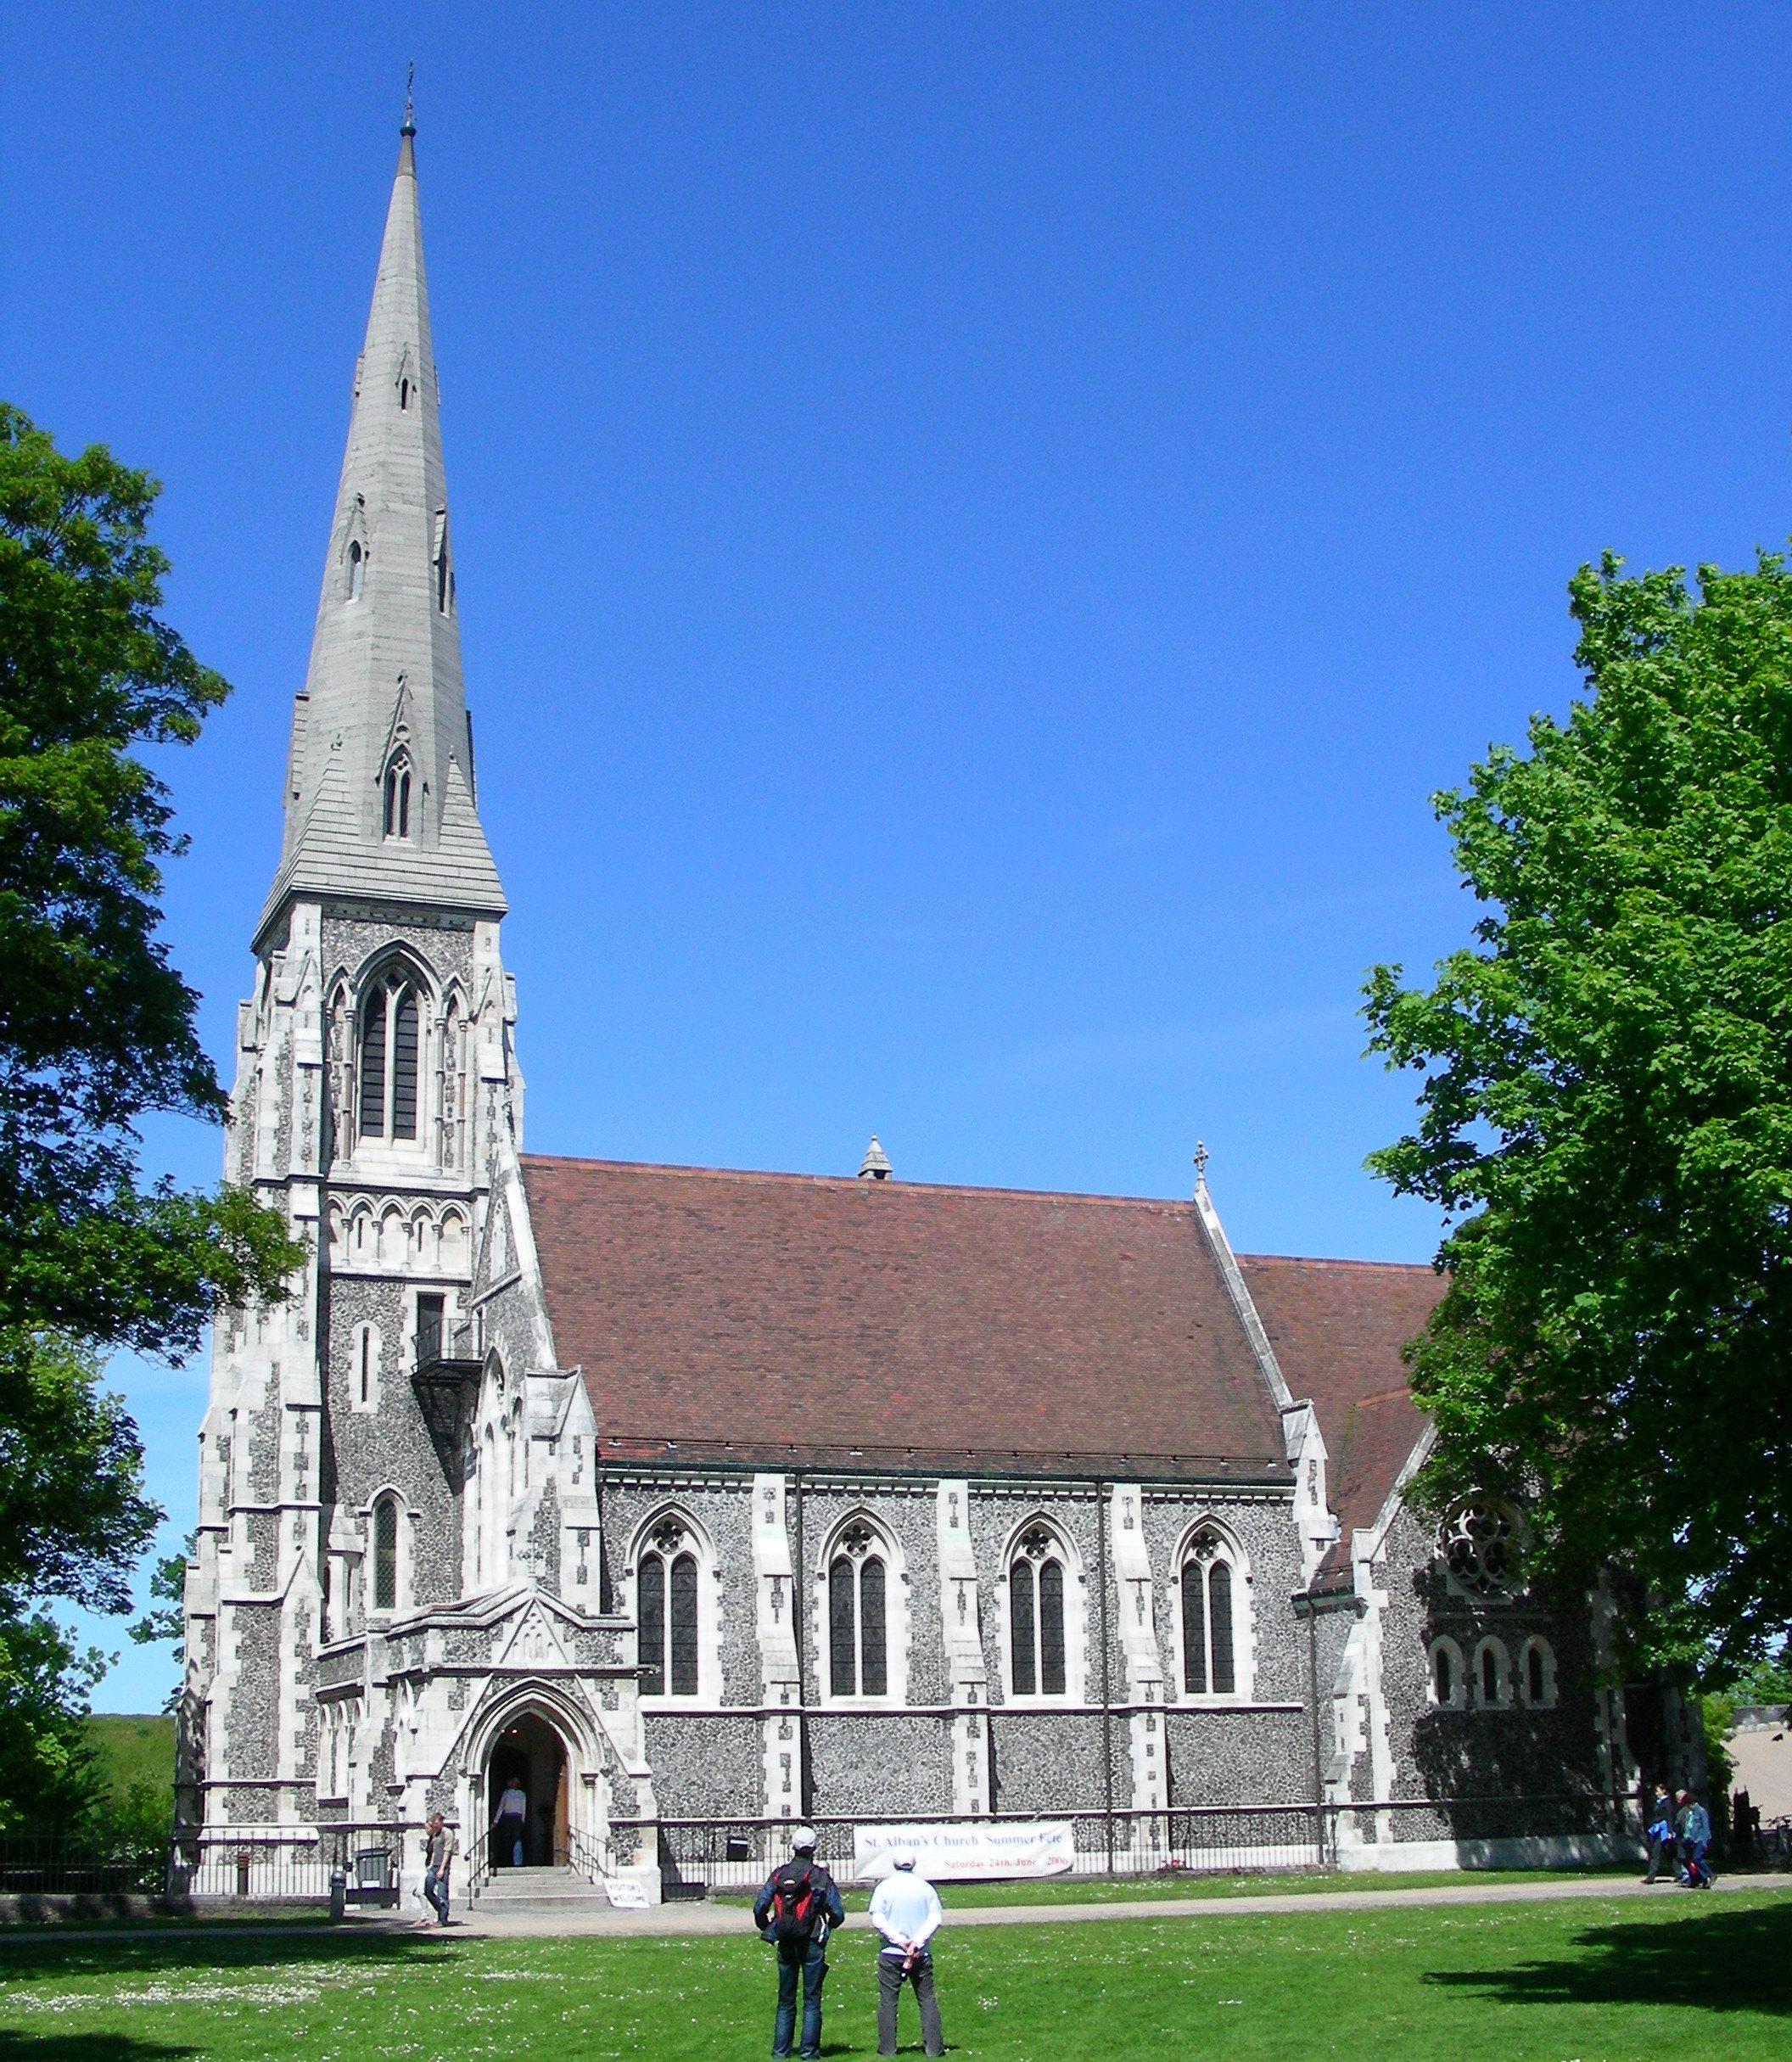 圣阿爾班教堂  St. Alban's Church   -4